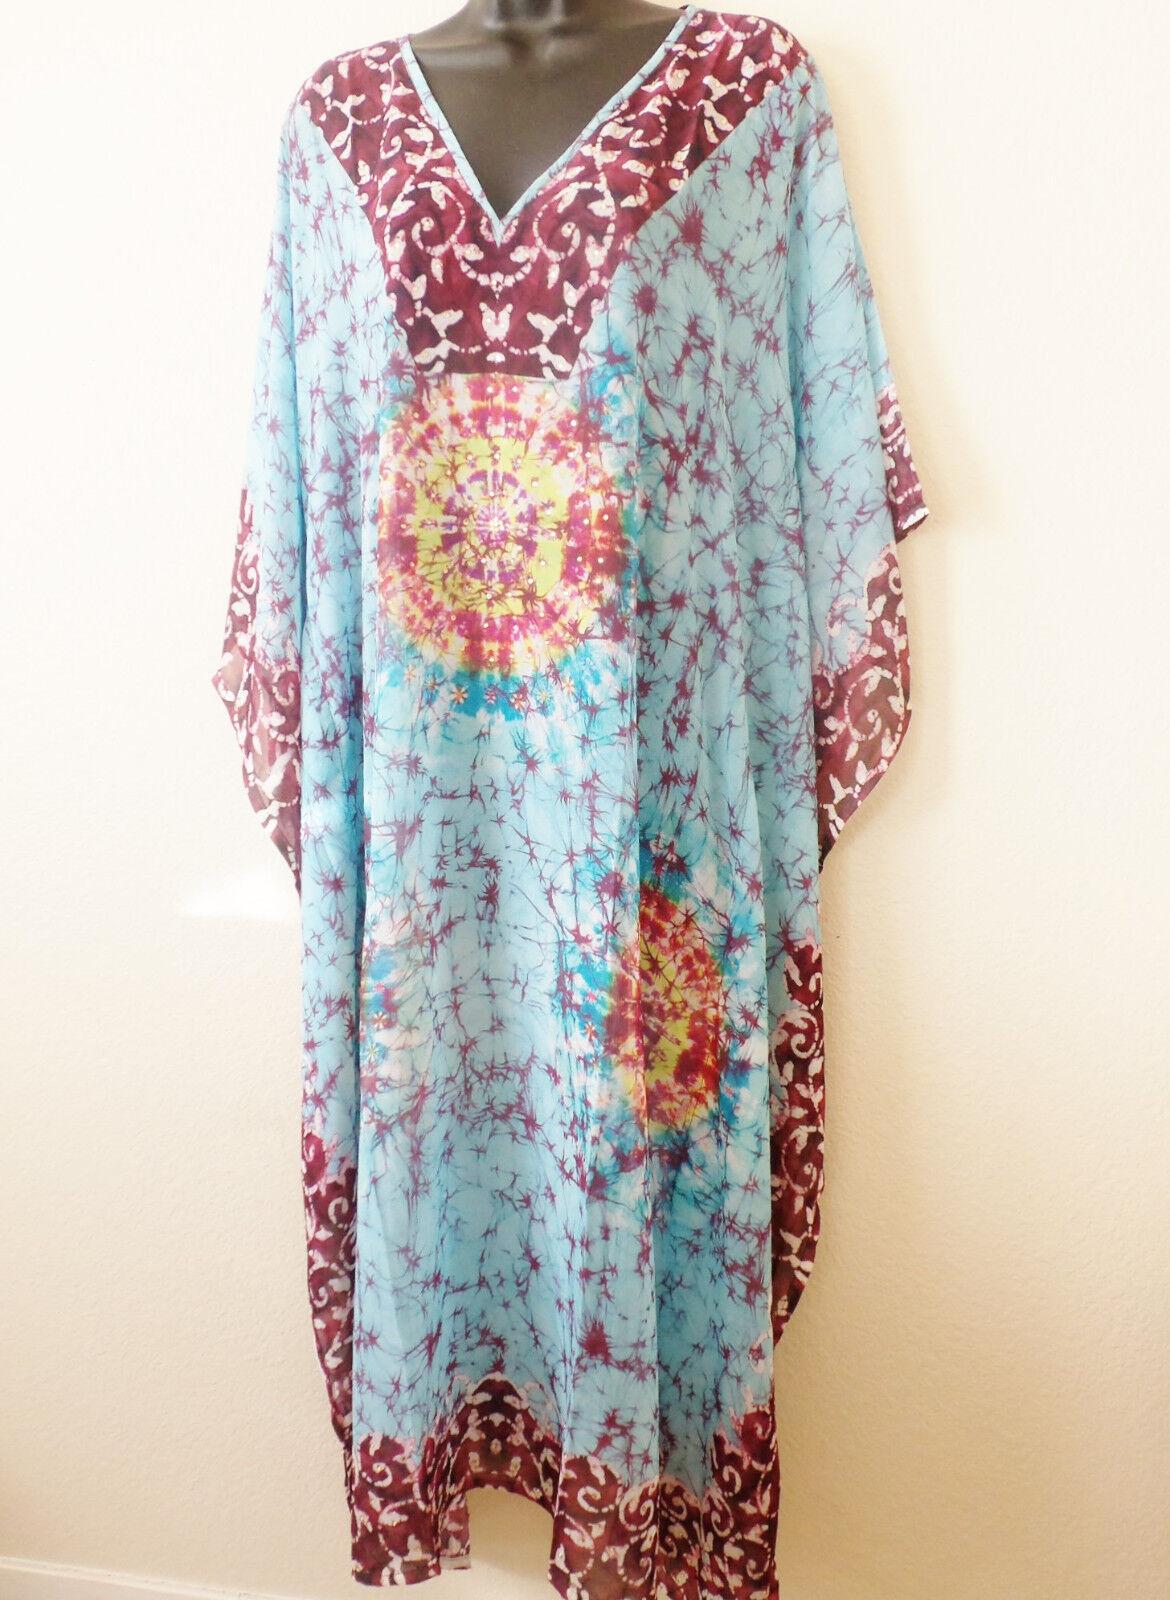 Embellished Kaftan dress  tunic sheer light material tie dye print  free size